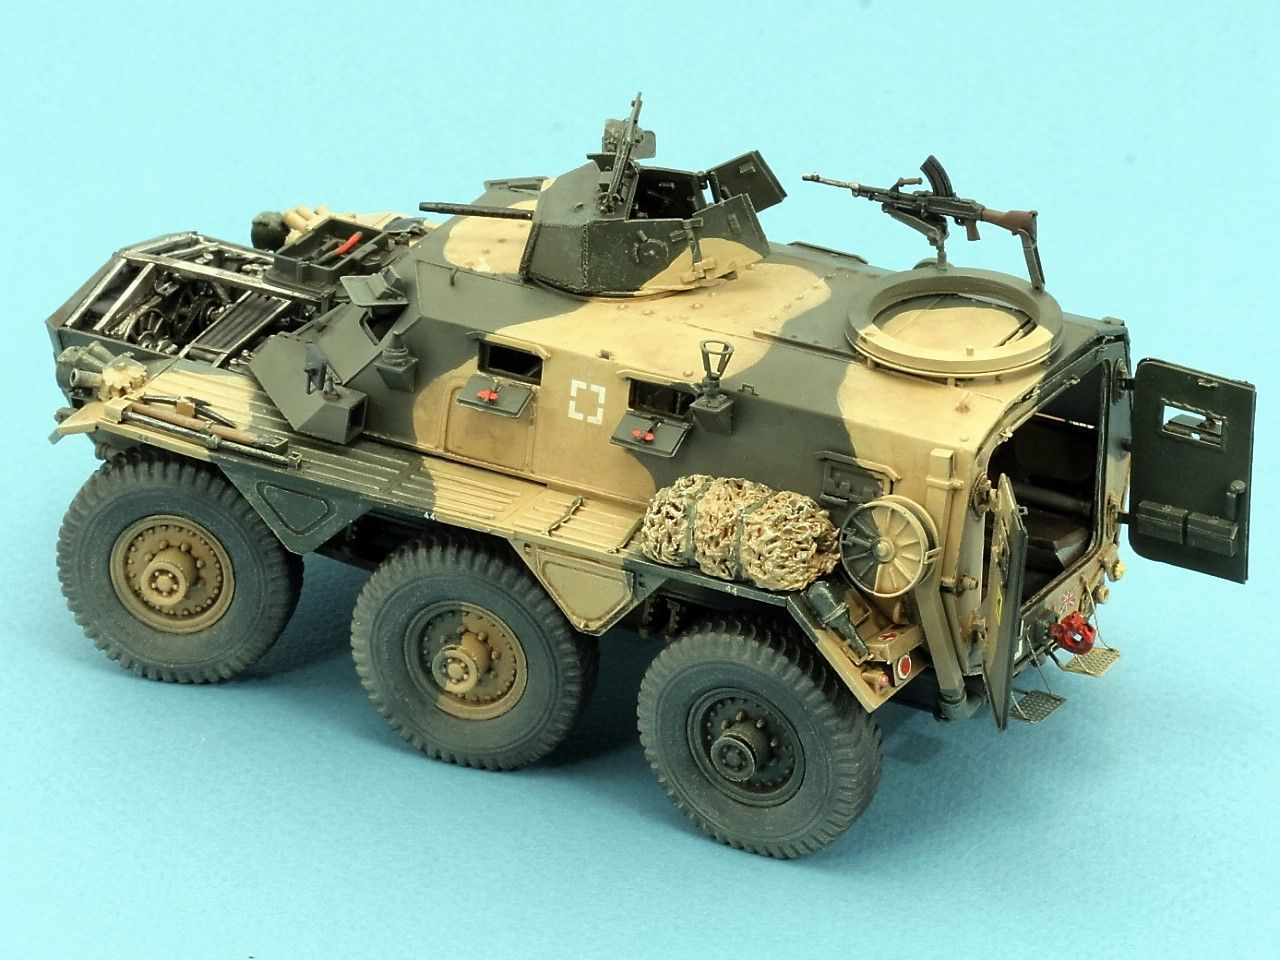 K191 Alvis SARACEN Mk-1 6x6 APC £110 00 | Armored vehicles